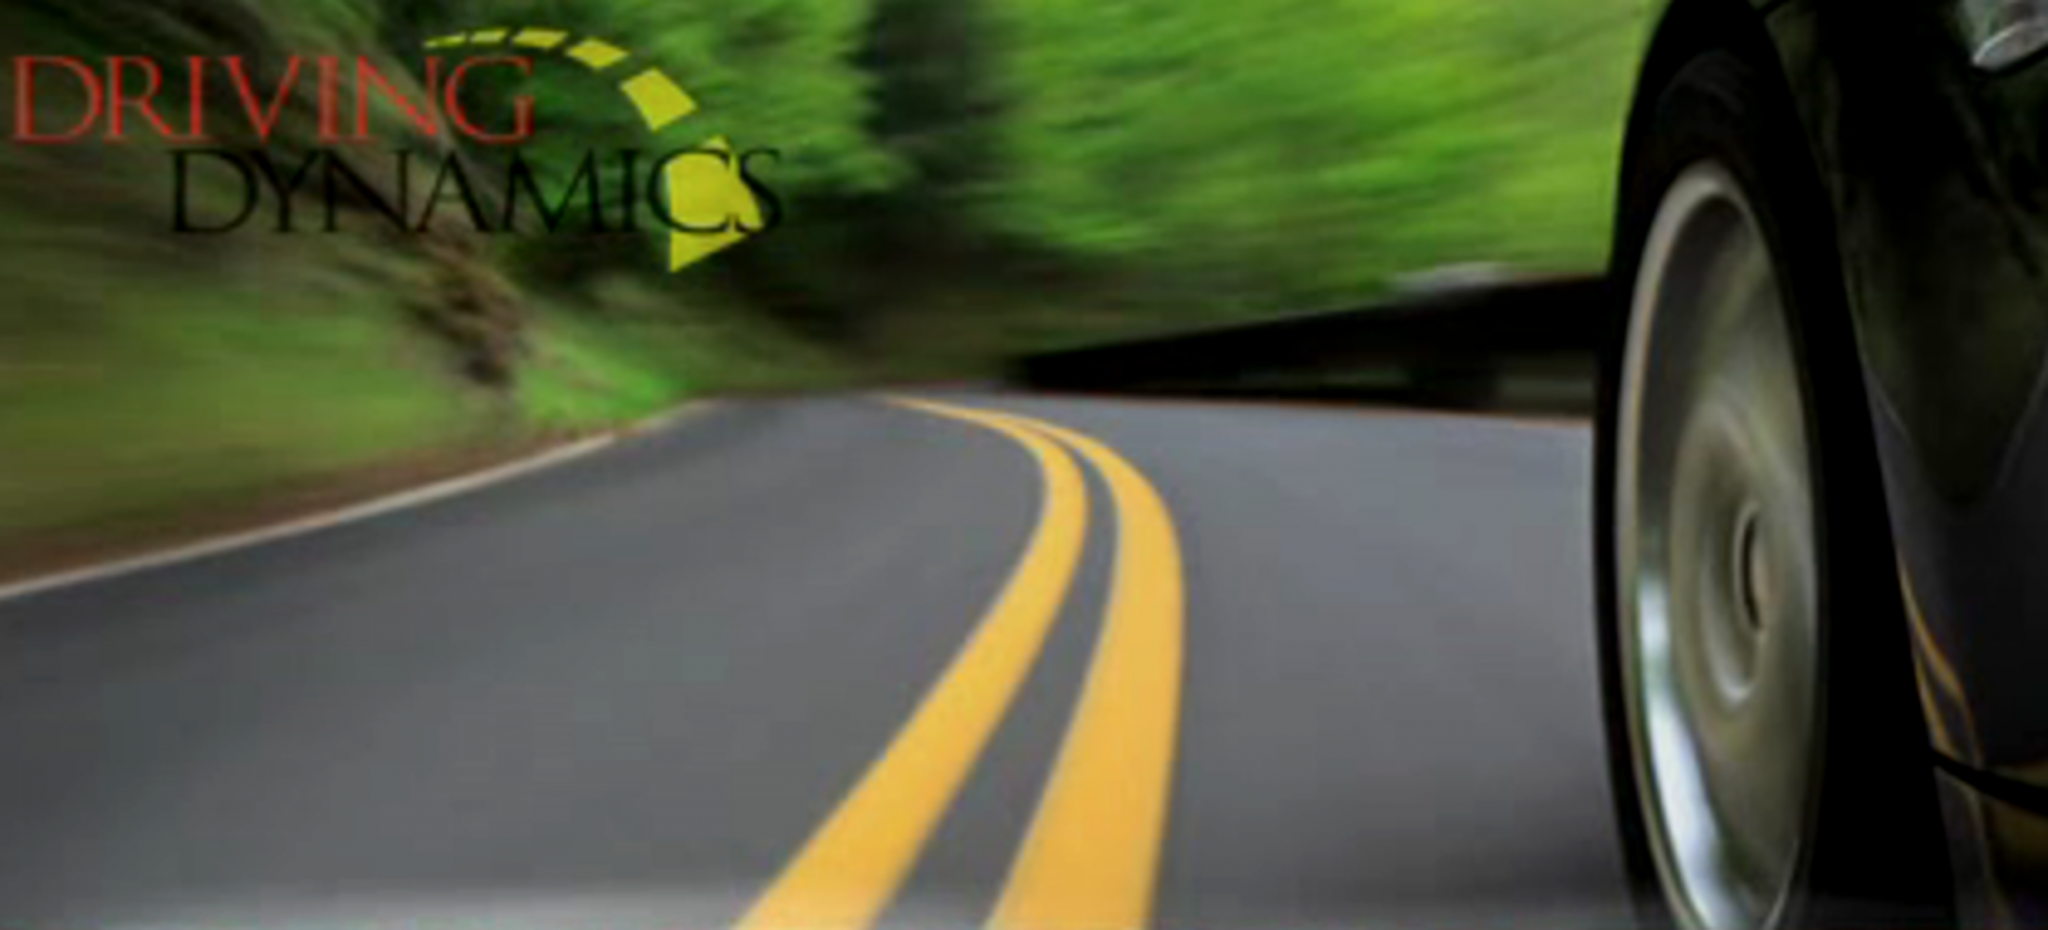 Maine Driver Dynamics